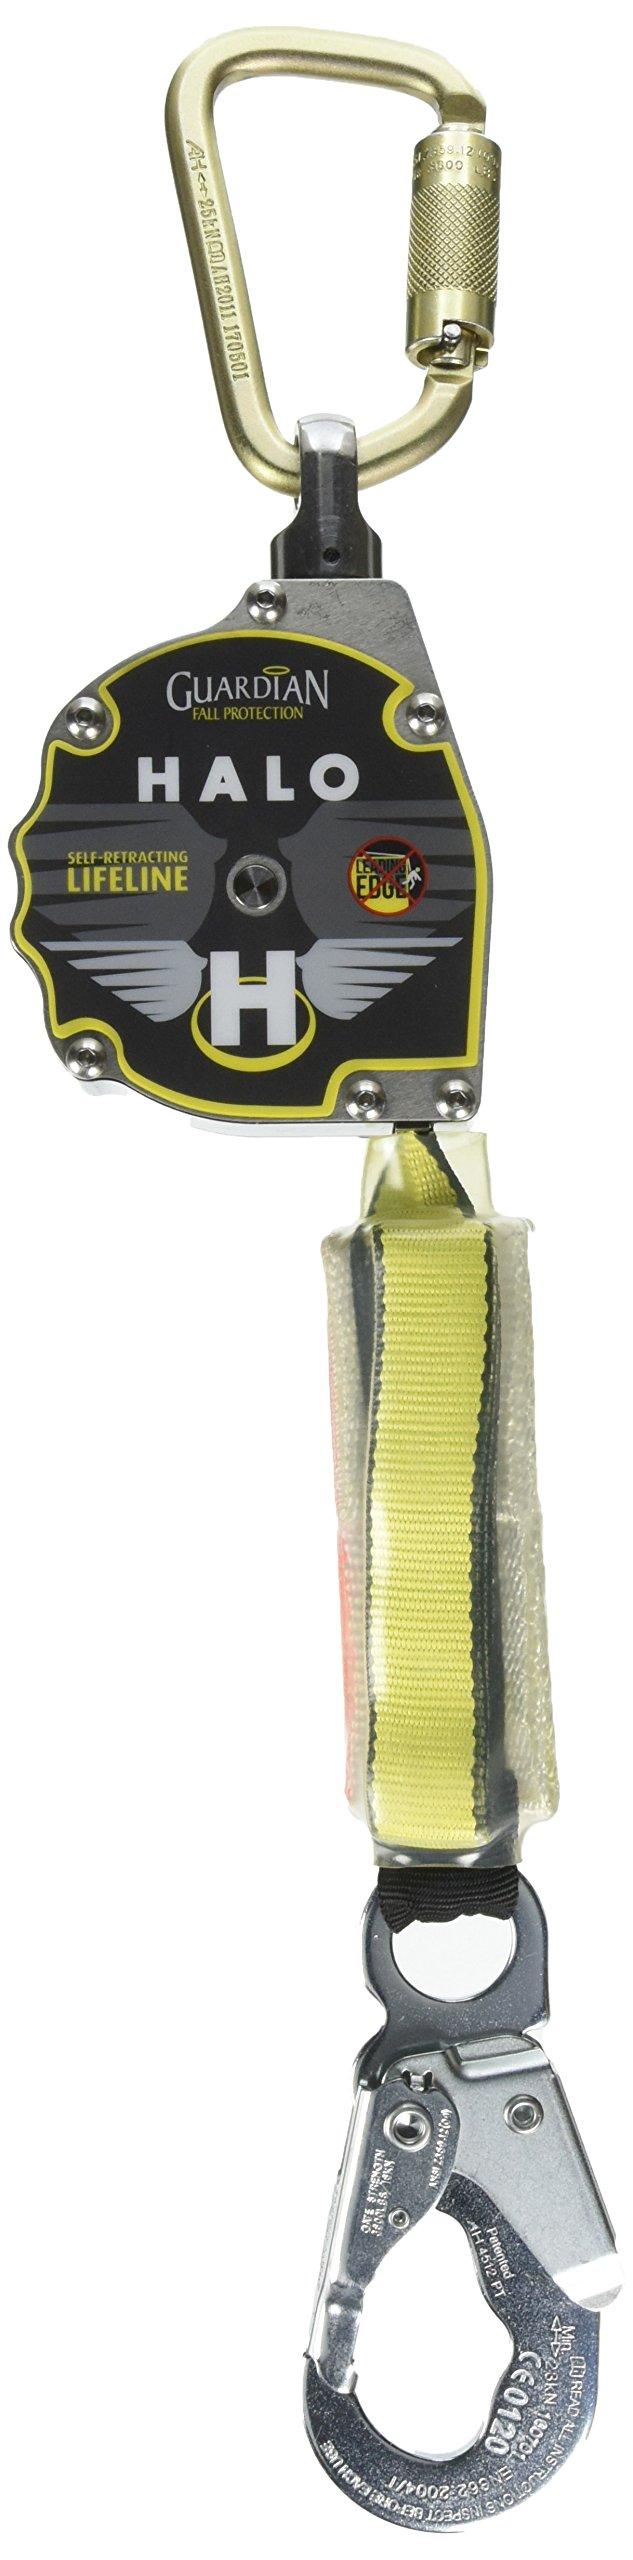 Guardian Fall Protection 10900 11-Foot 1-Inch Nylon Webbing with Carabineer